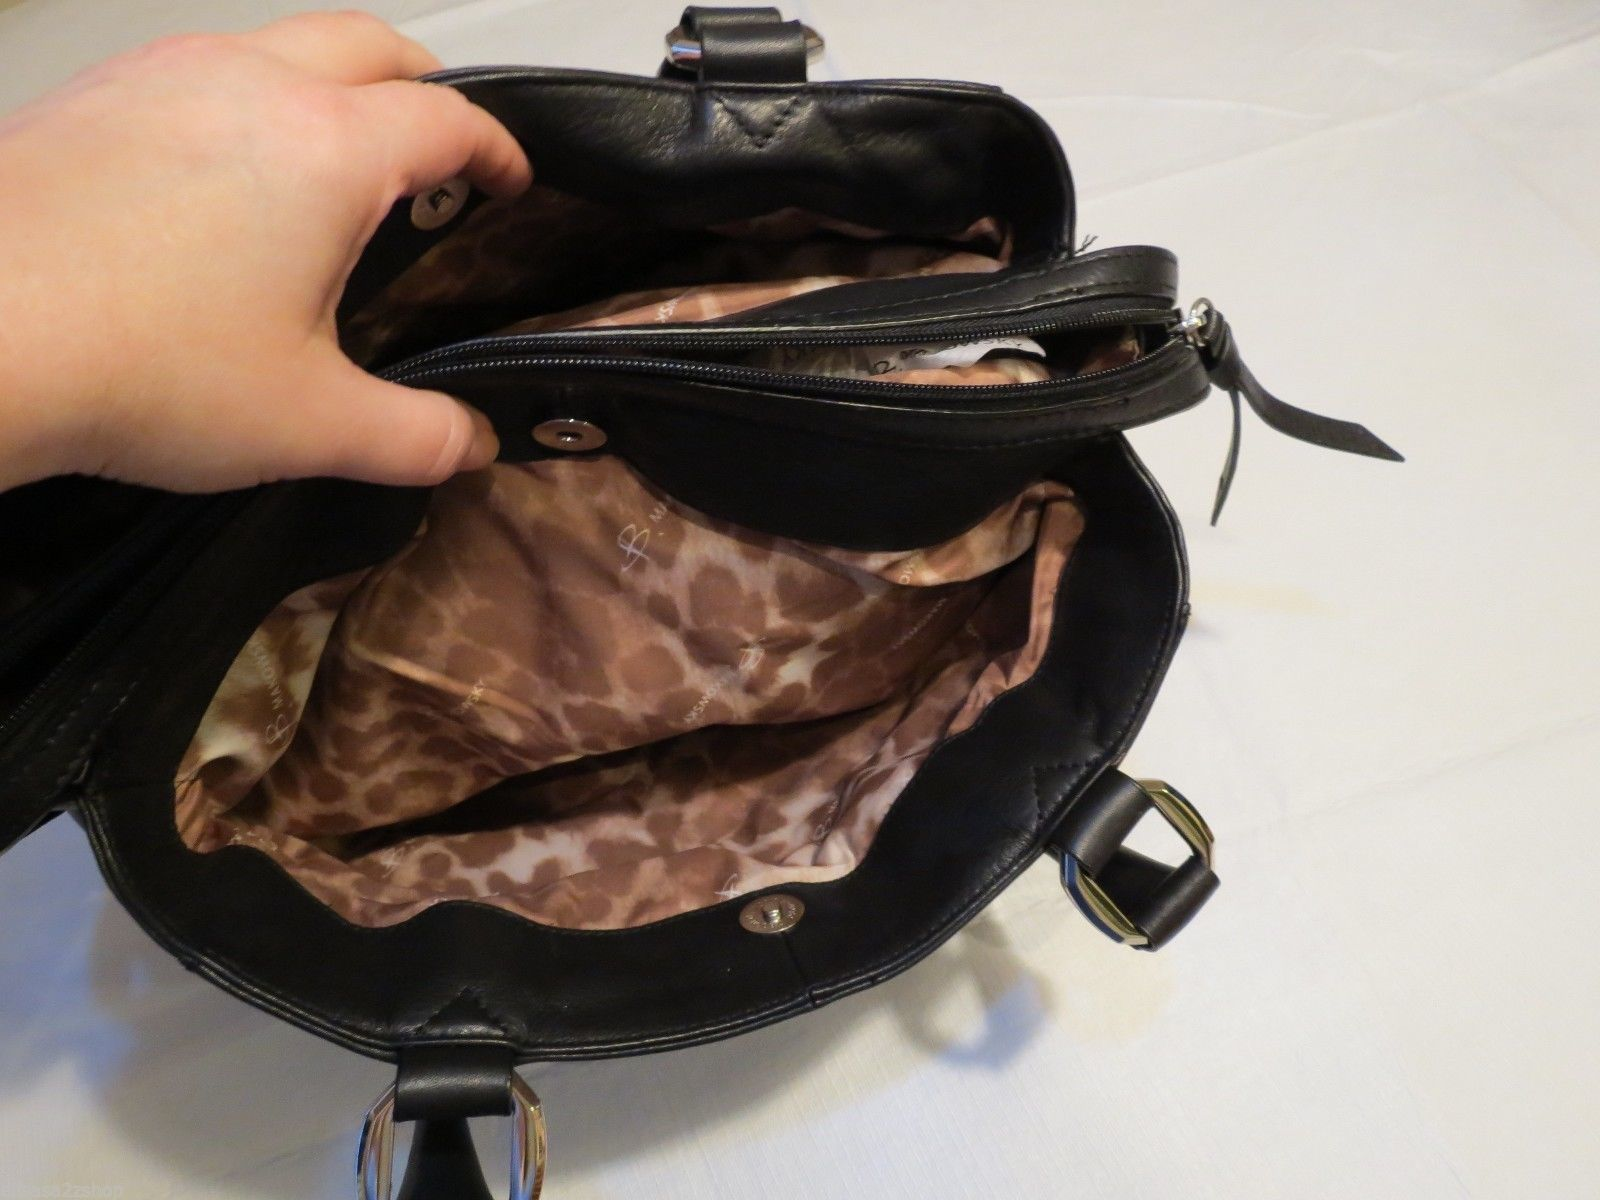 B. Makowsky black soft leather purse tote hand bag organizer computer laptop image 6